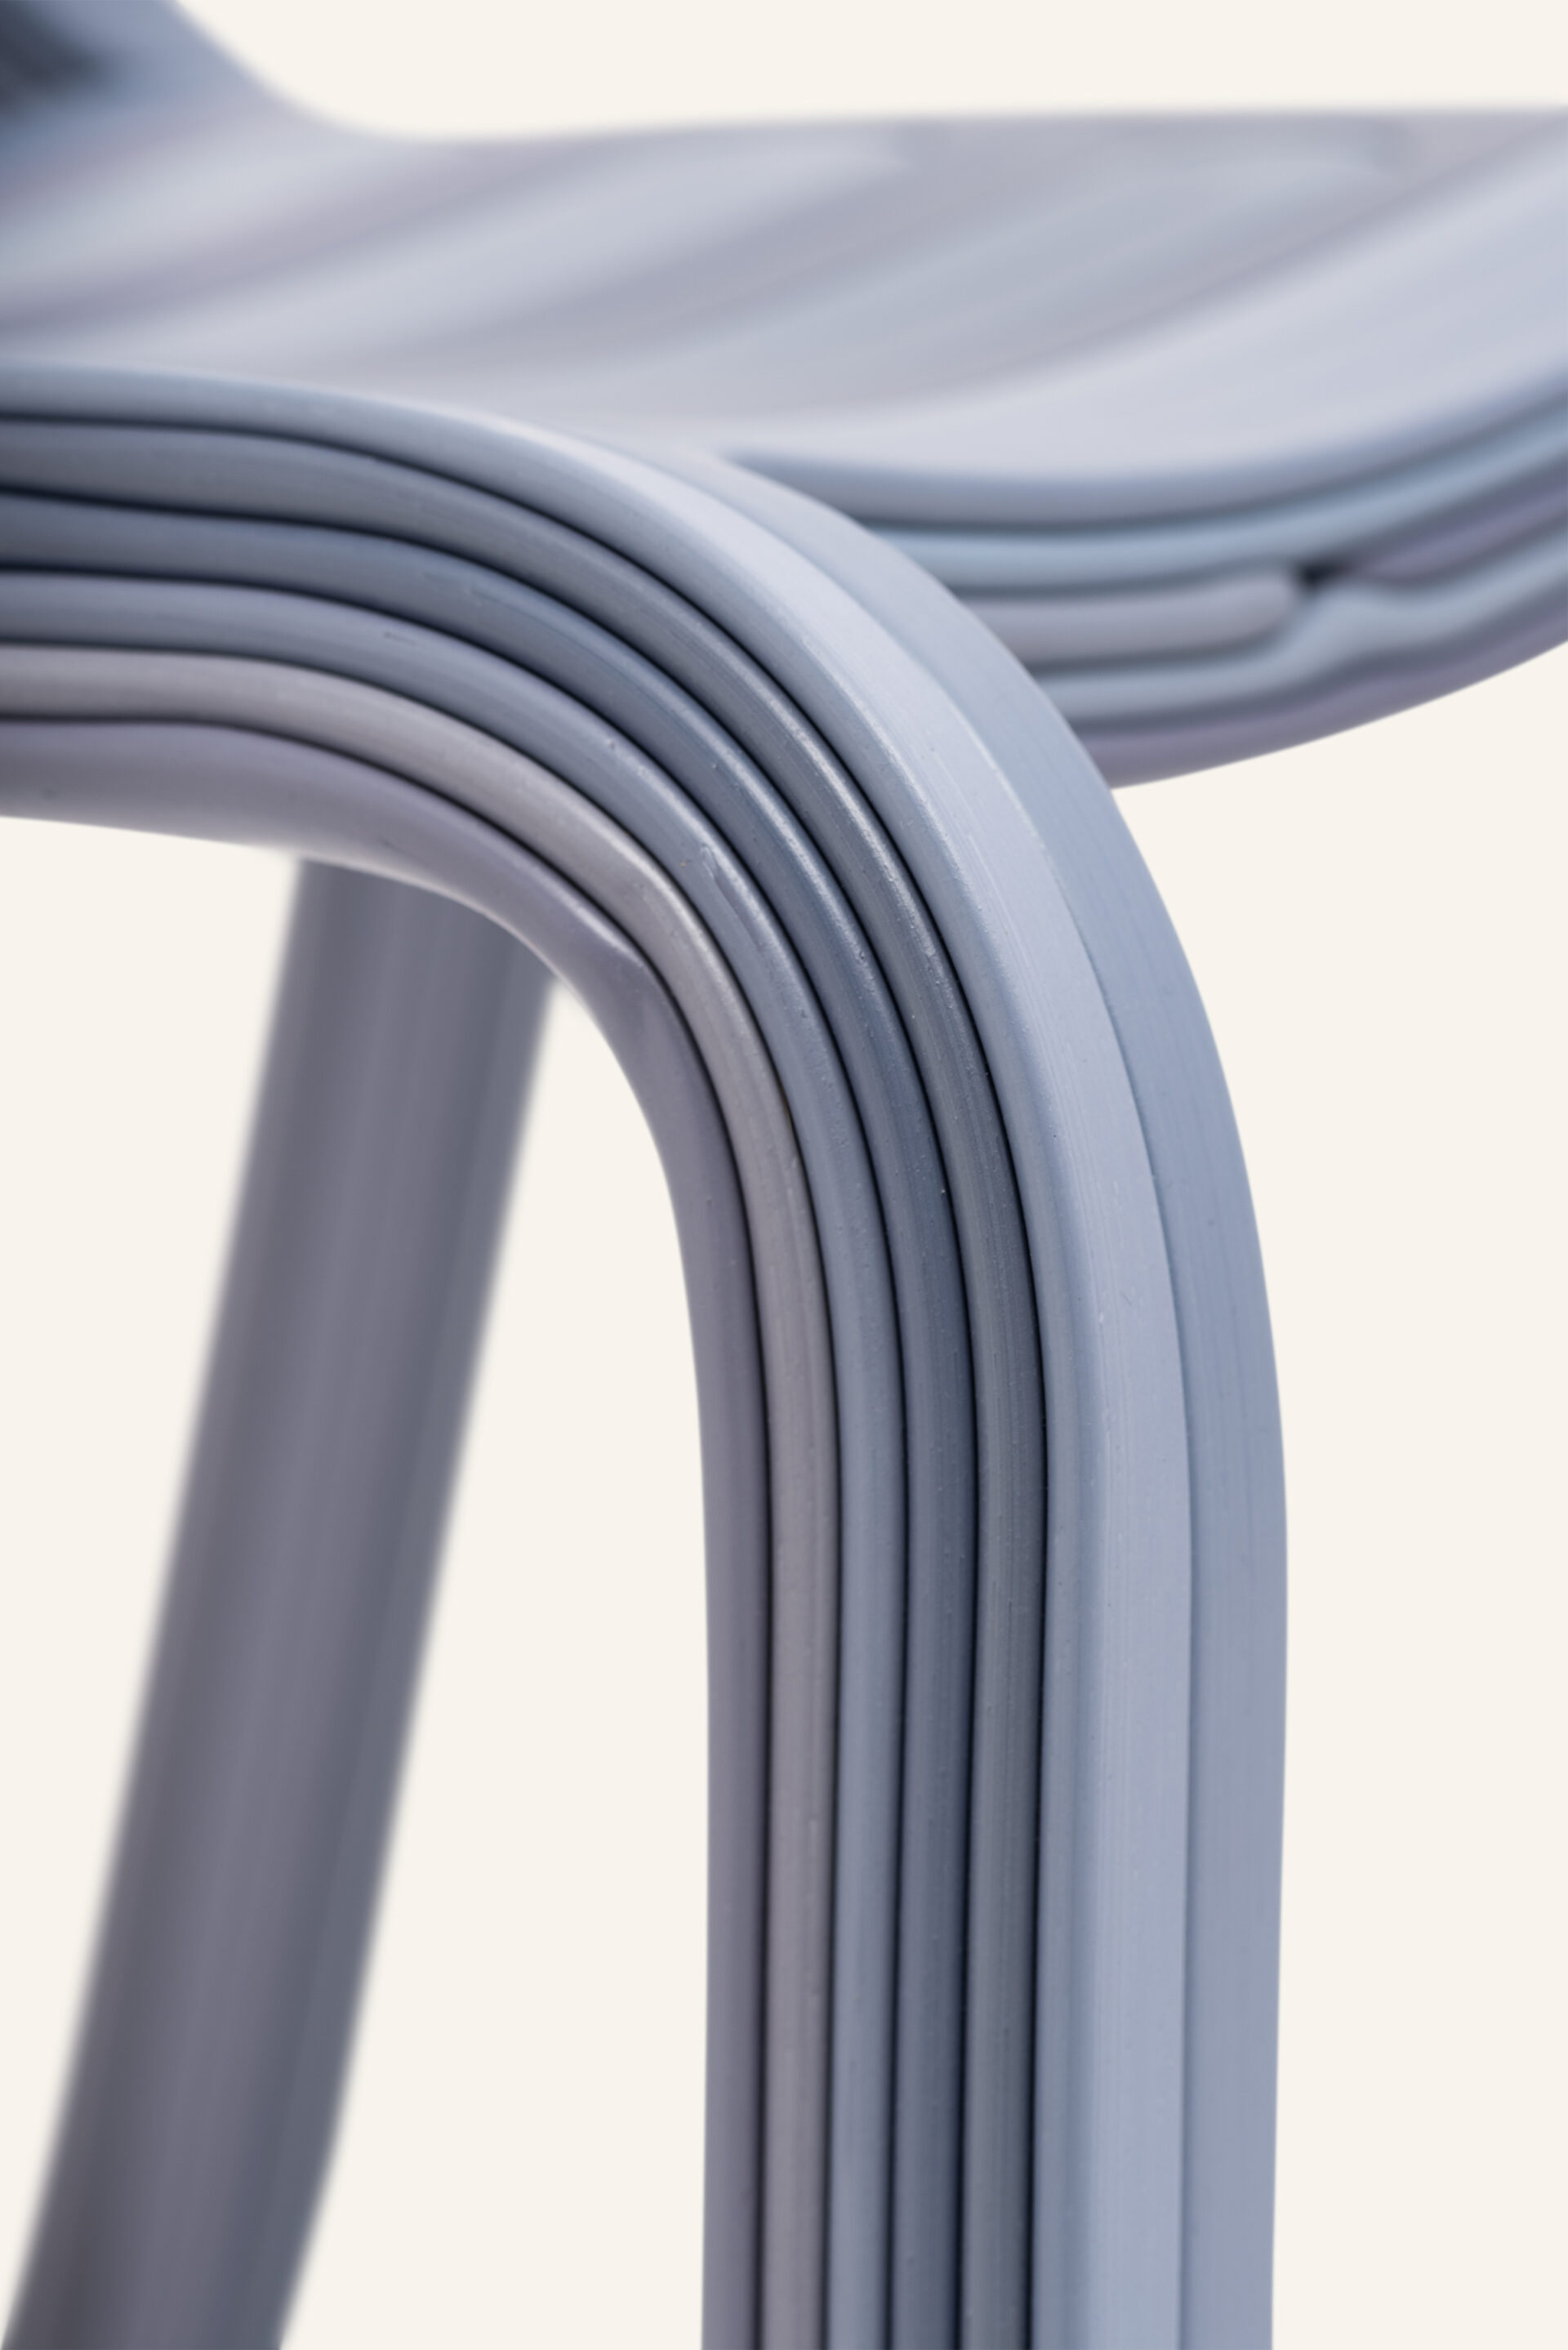 KOOIJ RVR chair designed by Dirk van der Kooij